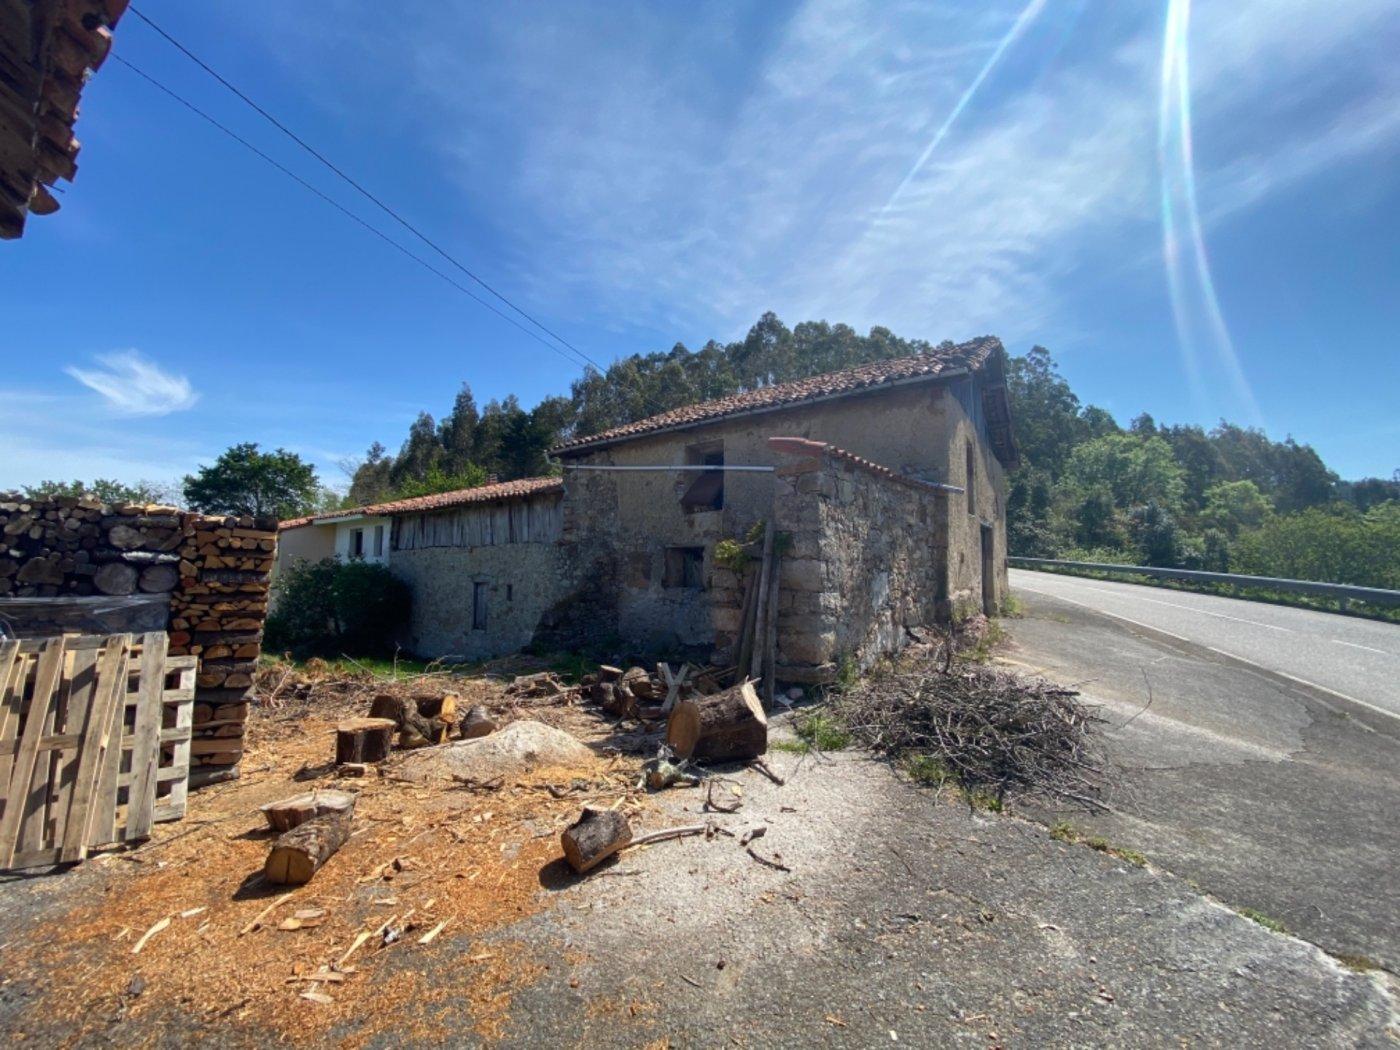 Cuadra para rehabilitar a 5 kilómetros de villaviciosa - imagenInmueble2